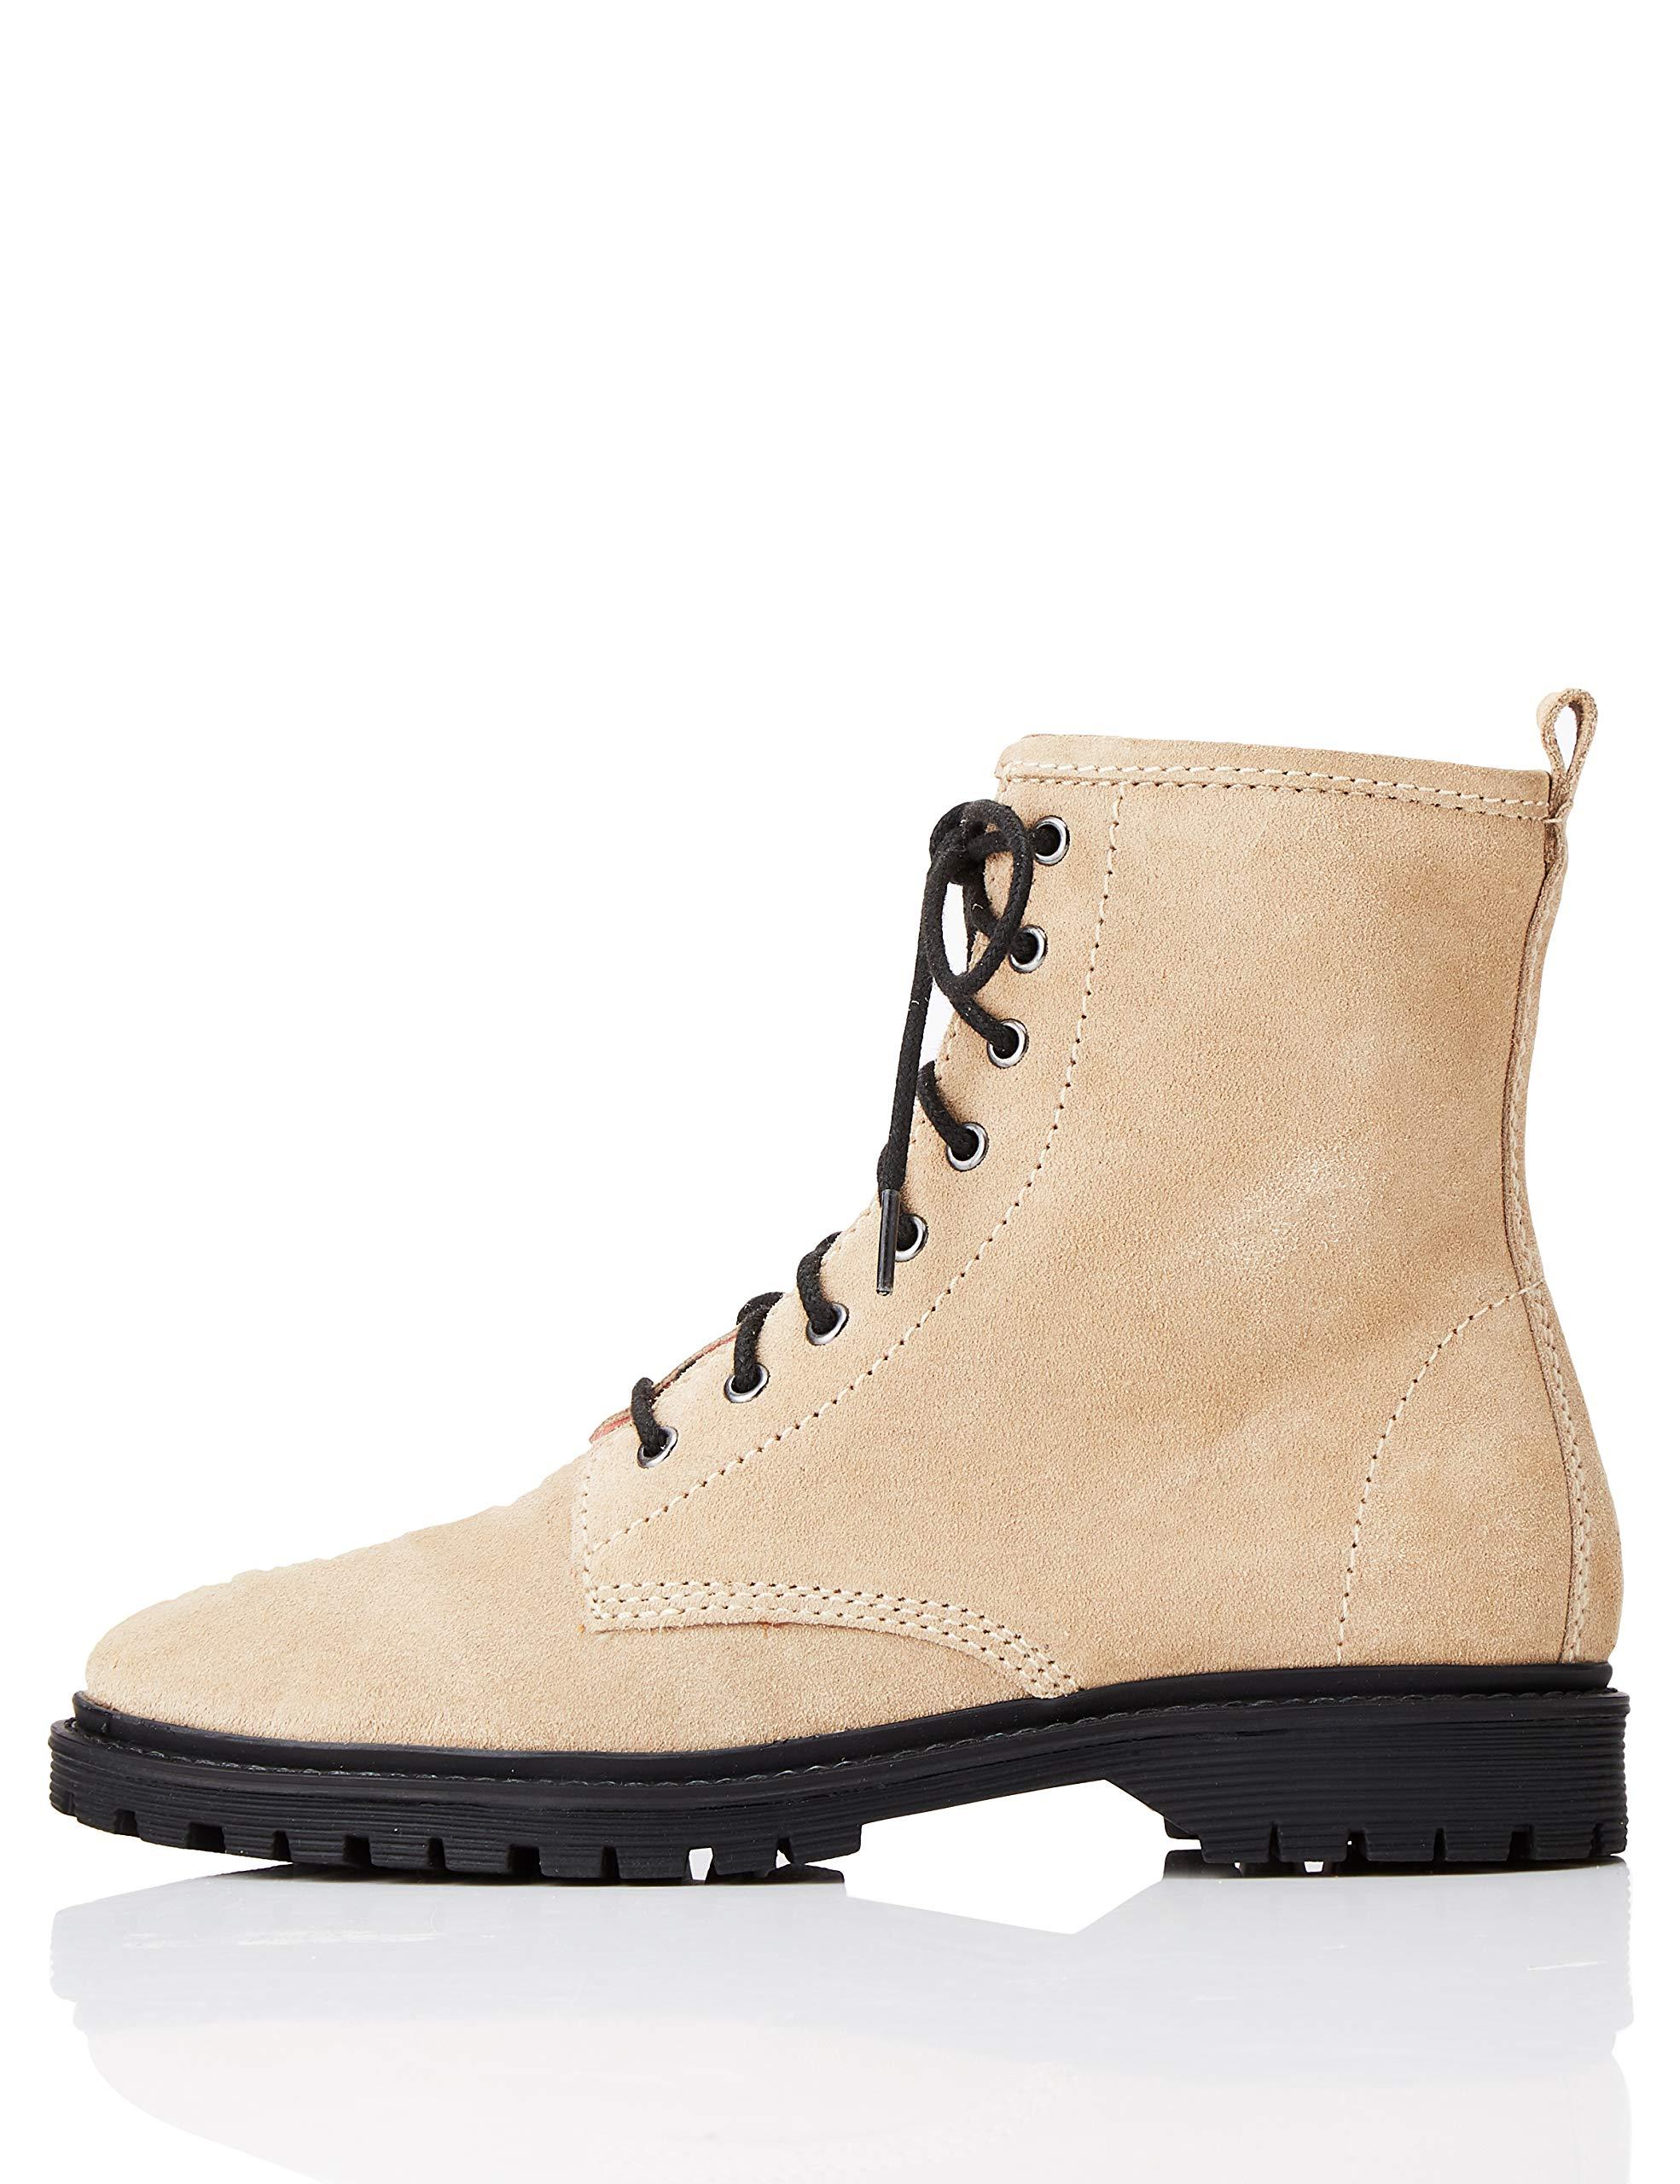 FindLace BootsMarron Up Desert Sand41 Eu Chunky ARL5j34